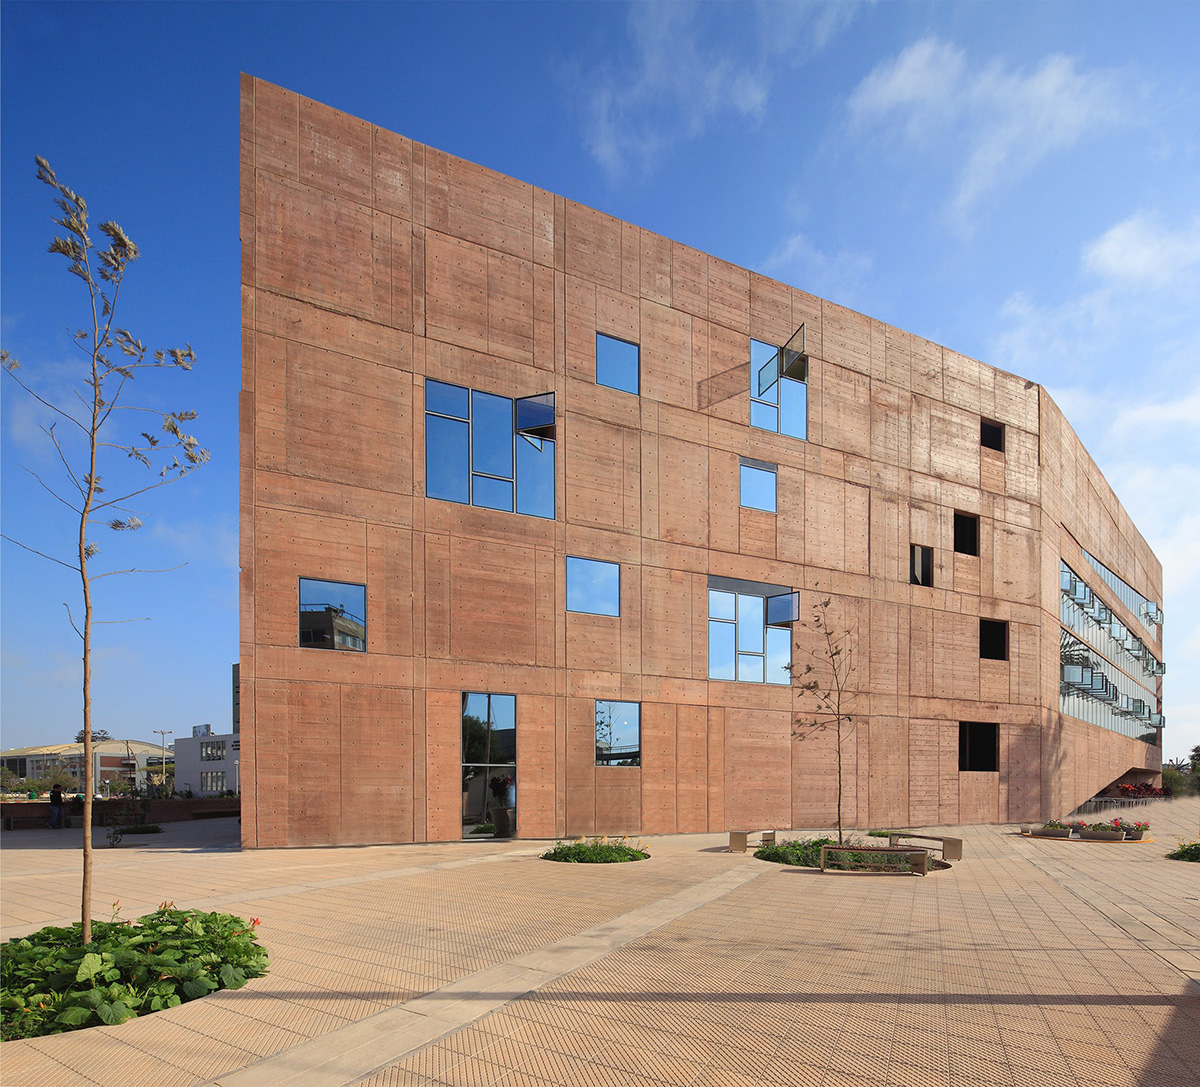 09-biblioteca-ciencias-ingenieria-arquitectura-pucp-foto-juan-solano-ojasi